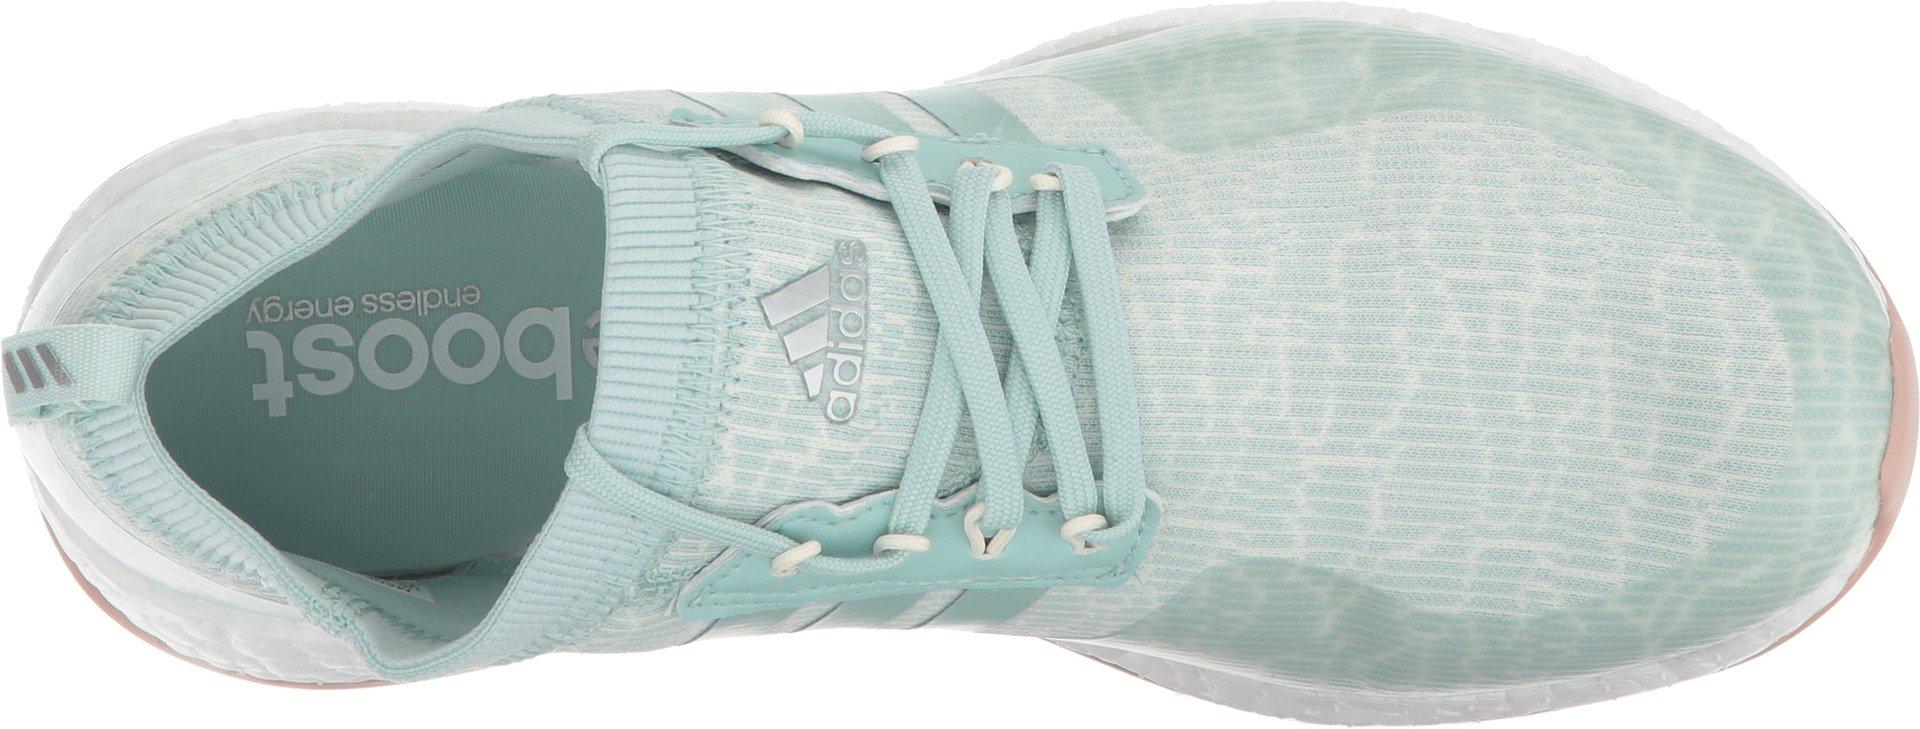 adidas Women's W Pure Boost Xg Golf Shoe, Ash Green/White Tint/Ash Pearl, 7 Medium US by adidas (Image #2)